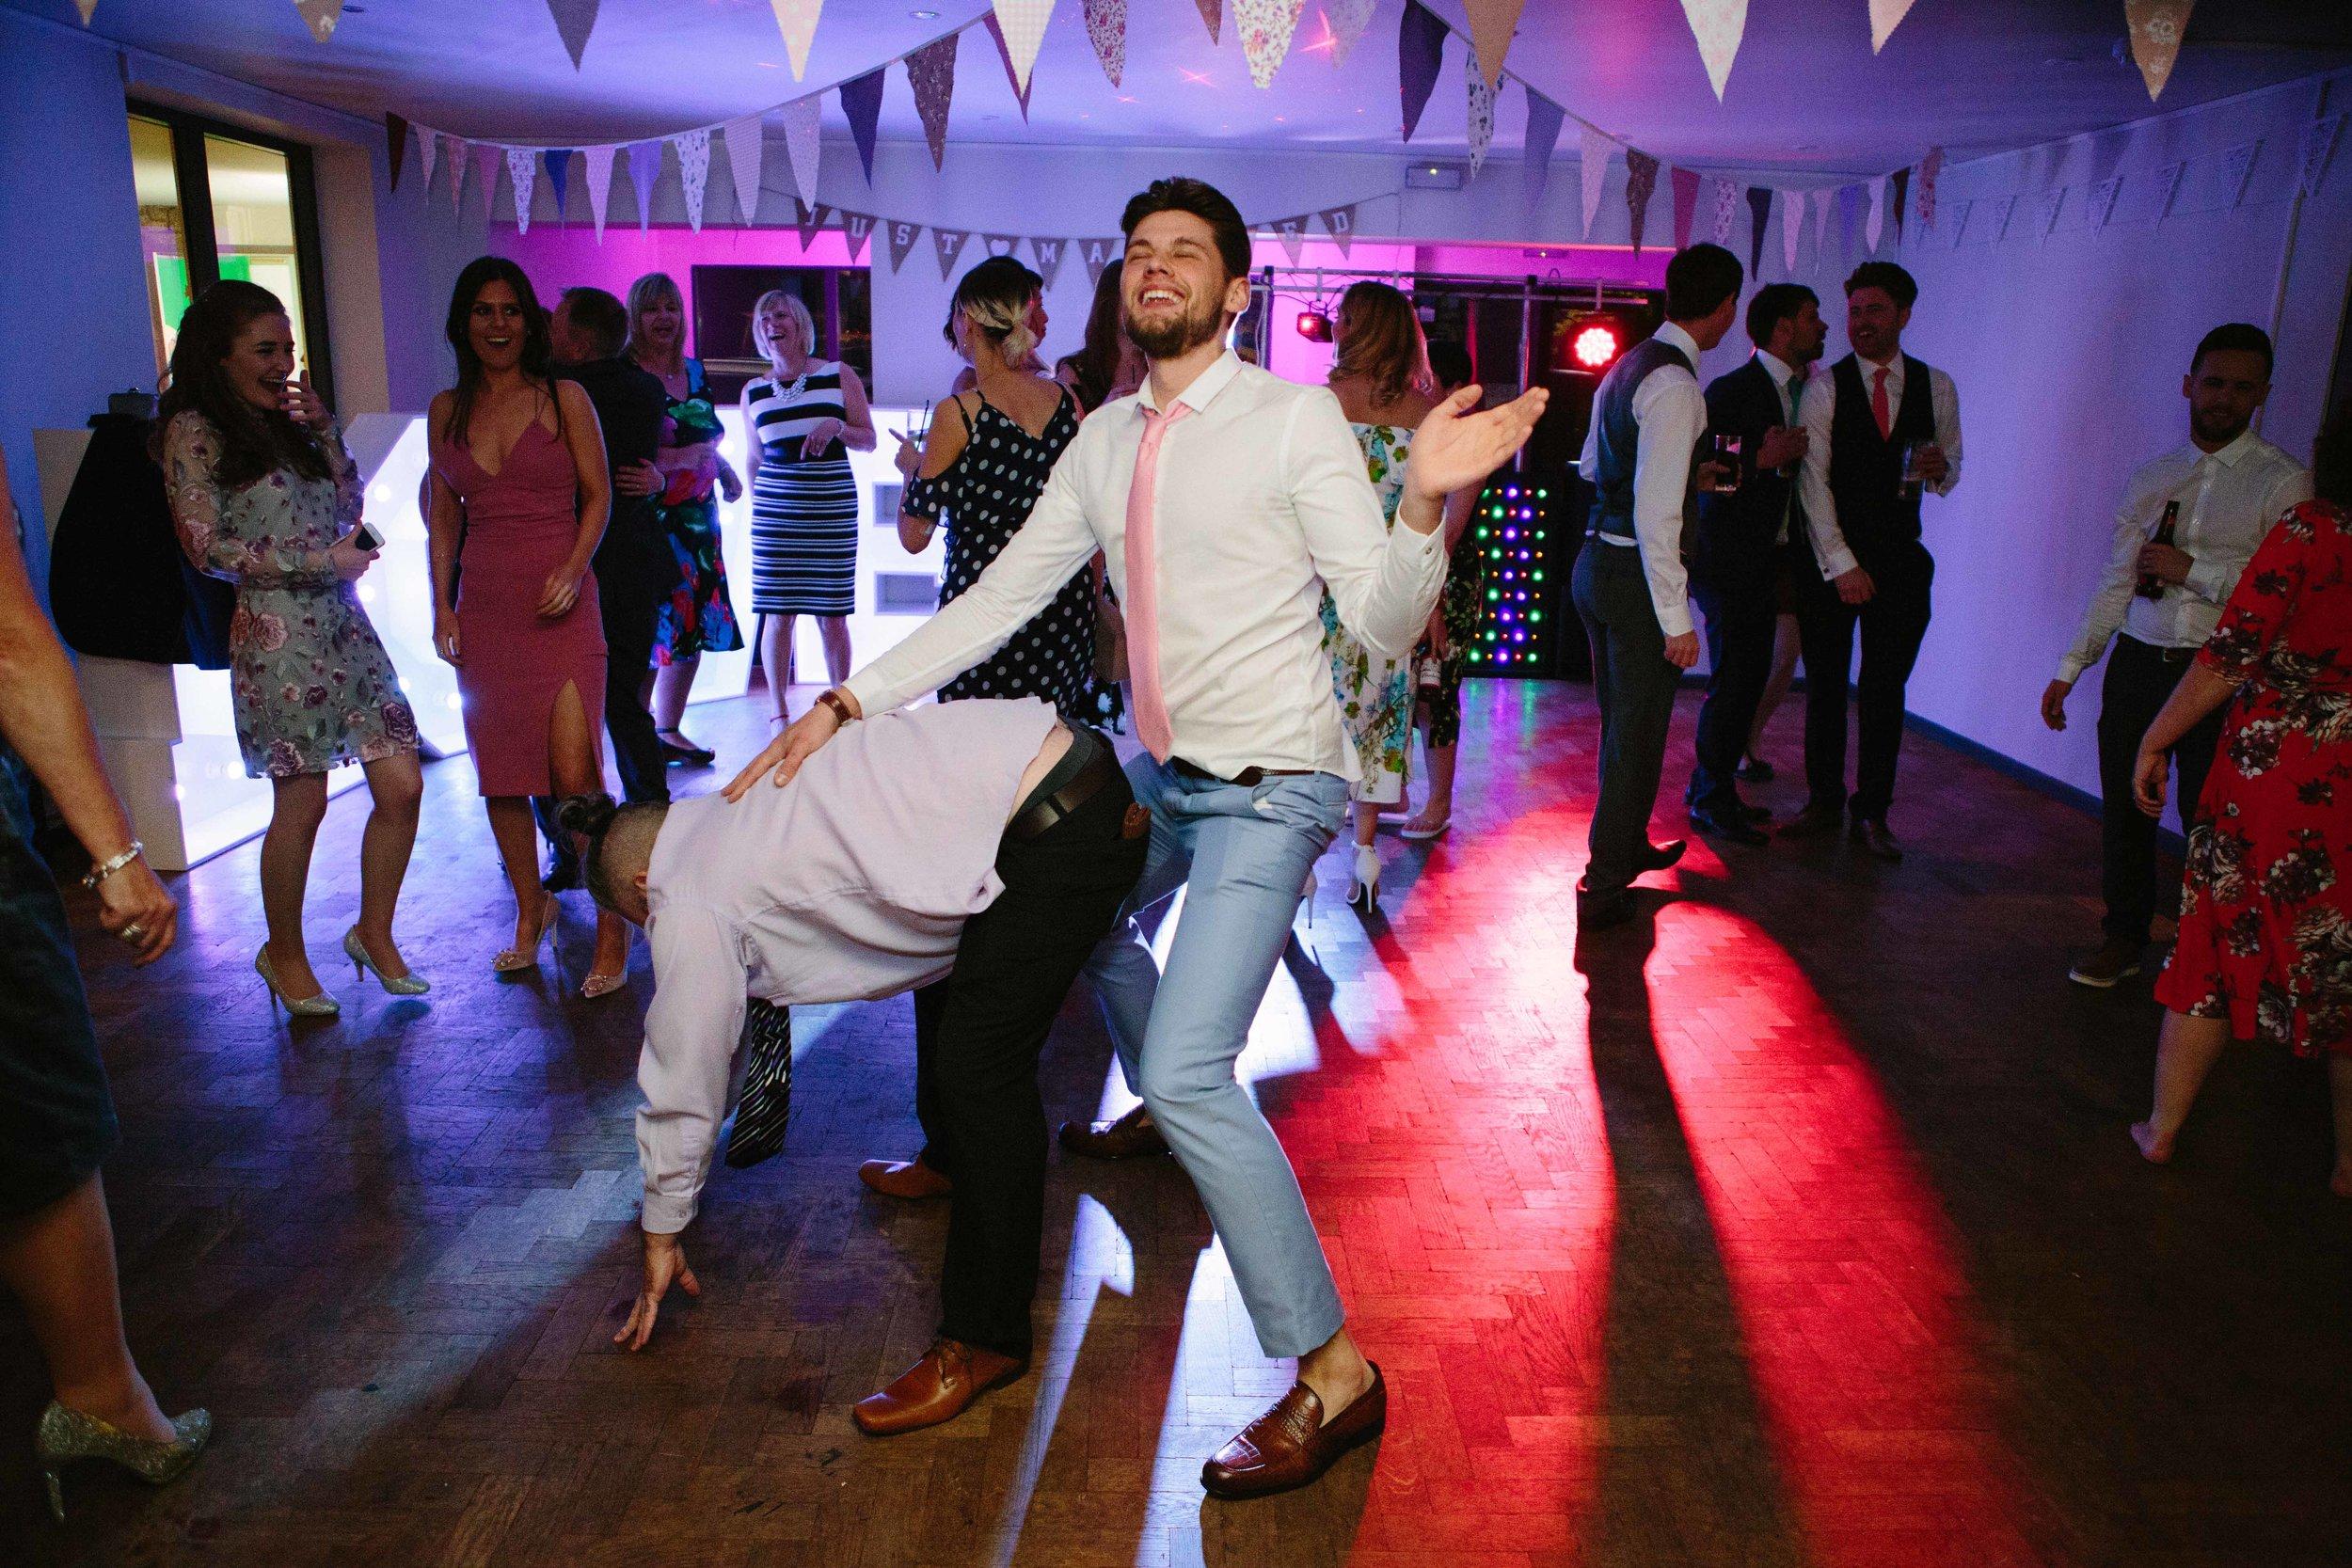 cotswalds-chipping-norton-oxfordshire-london-wedding-photography-bromance-55